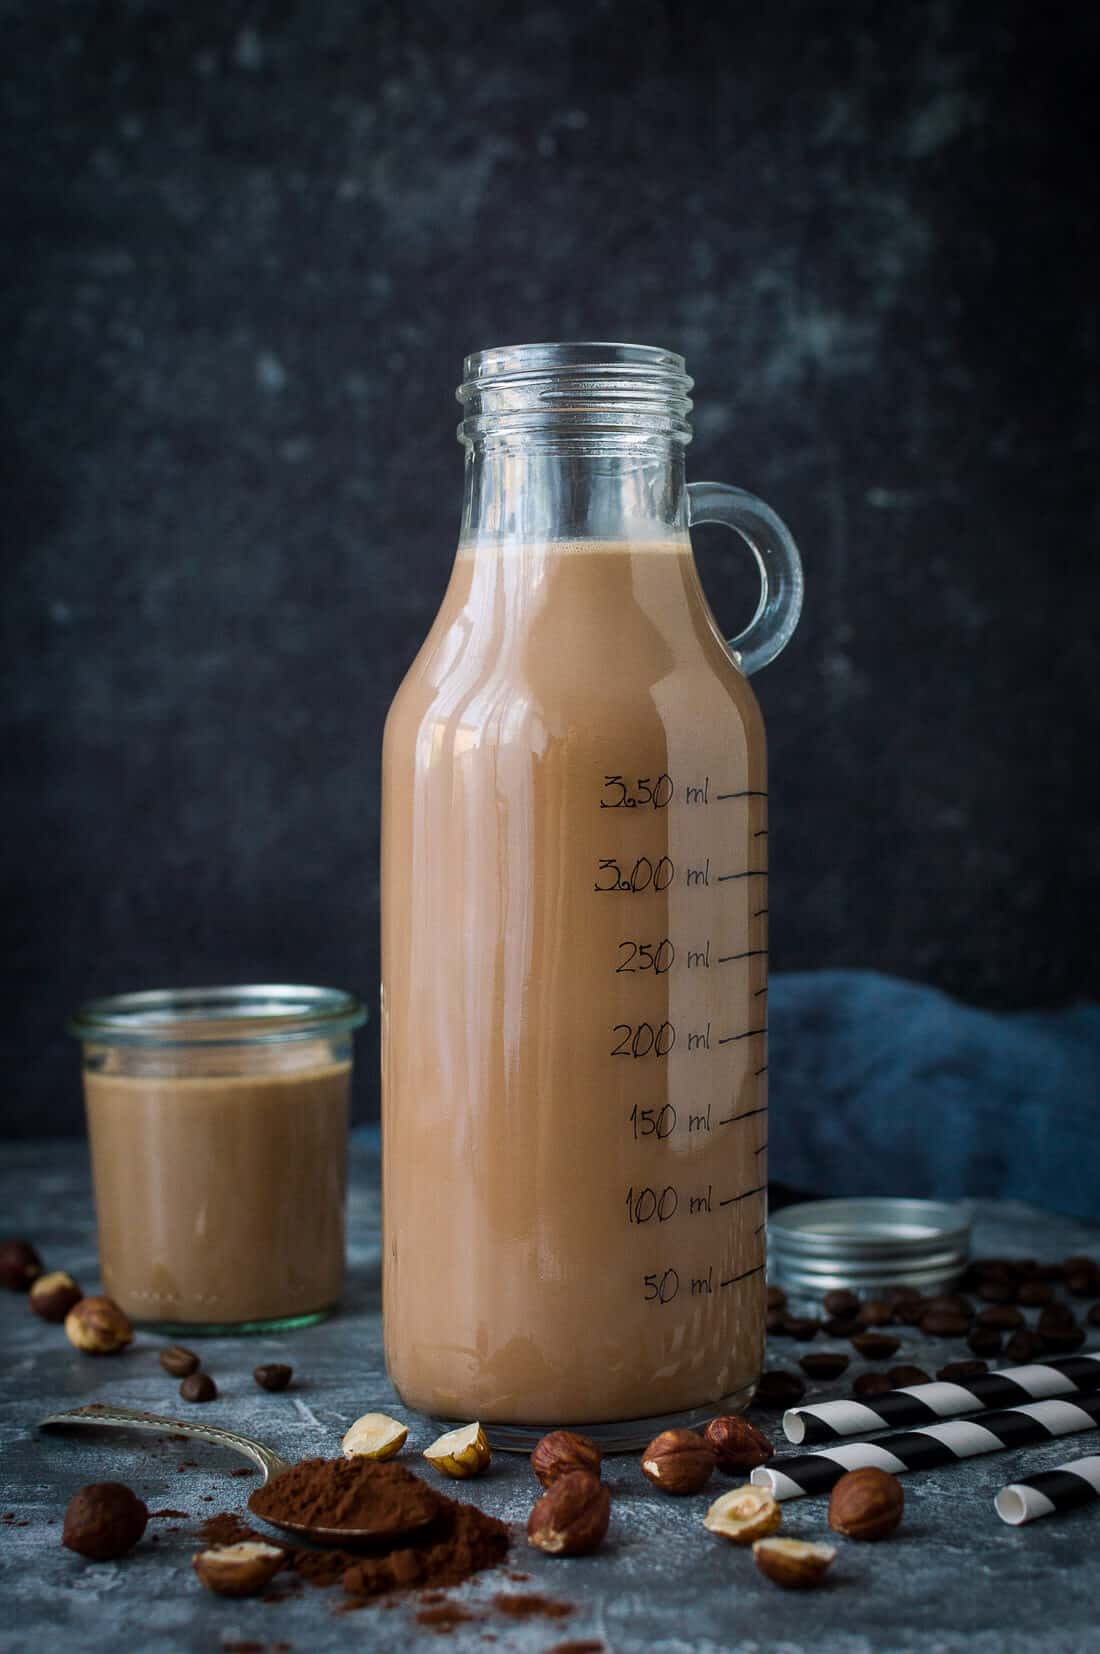 A bottle of mocha hazelnut milk - from scratch chocolate and coffee toasted hazelnut milk. Vegan/refined sugar free